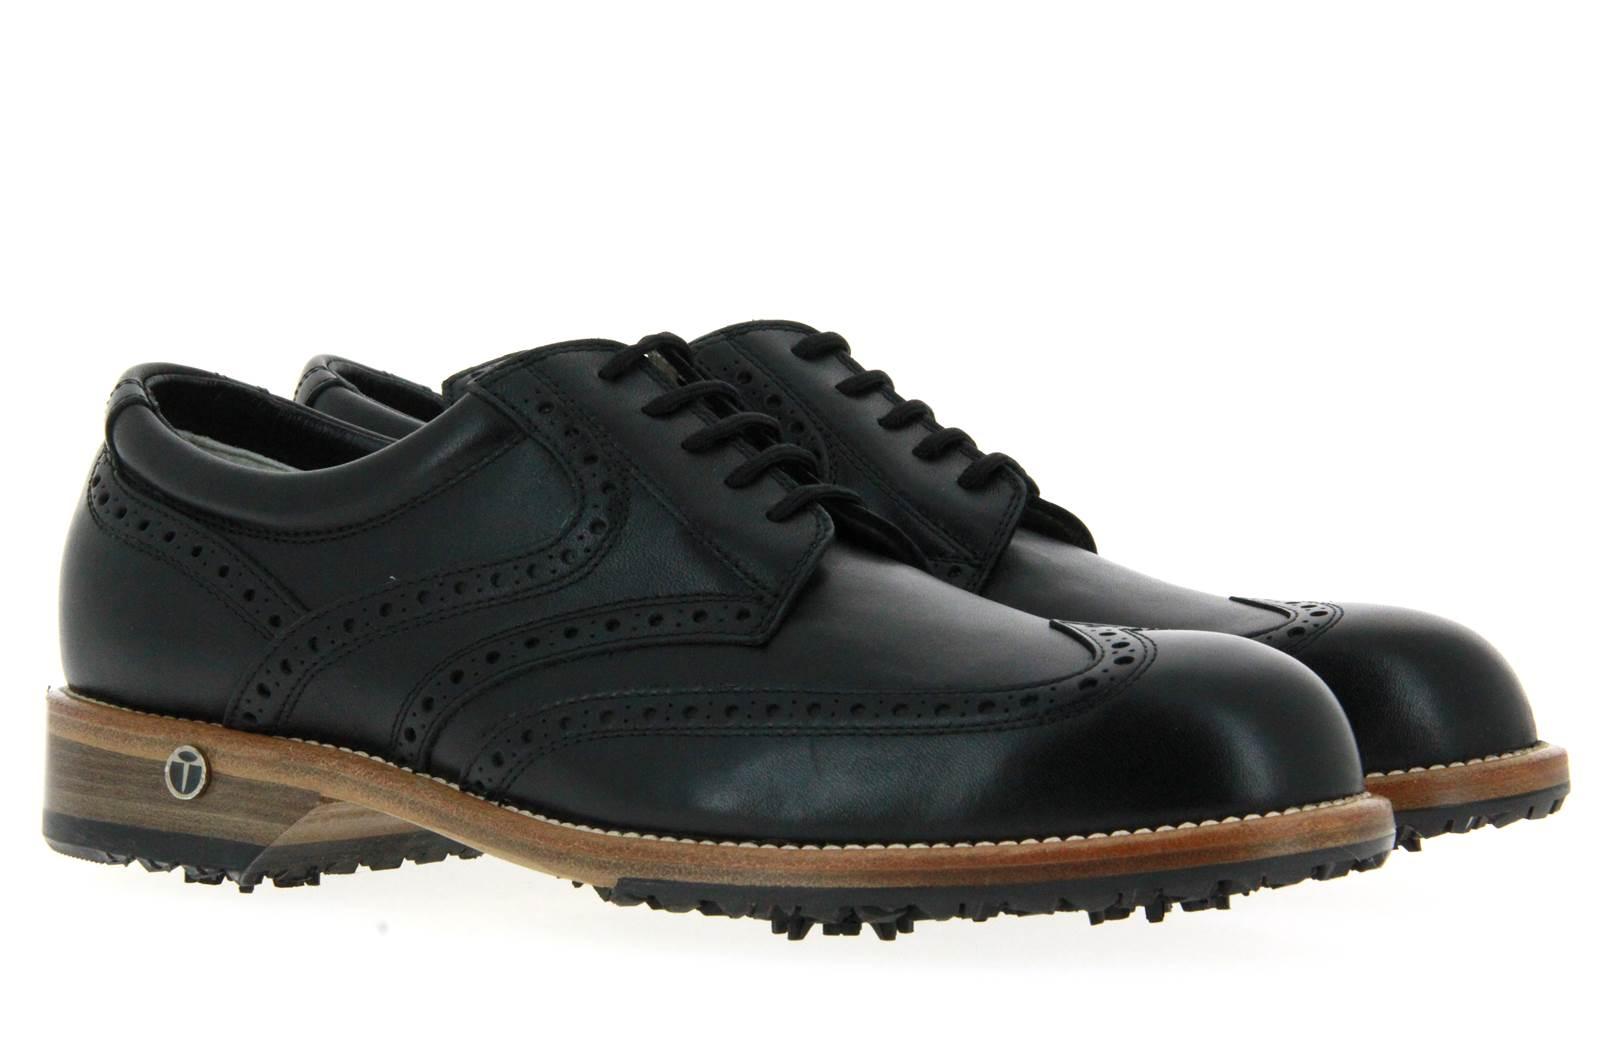 Tee Shoes Golfschuh TOMMY VITELLO IDRO NERO (42)